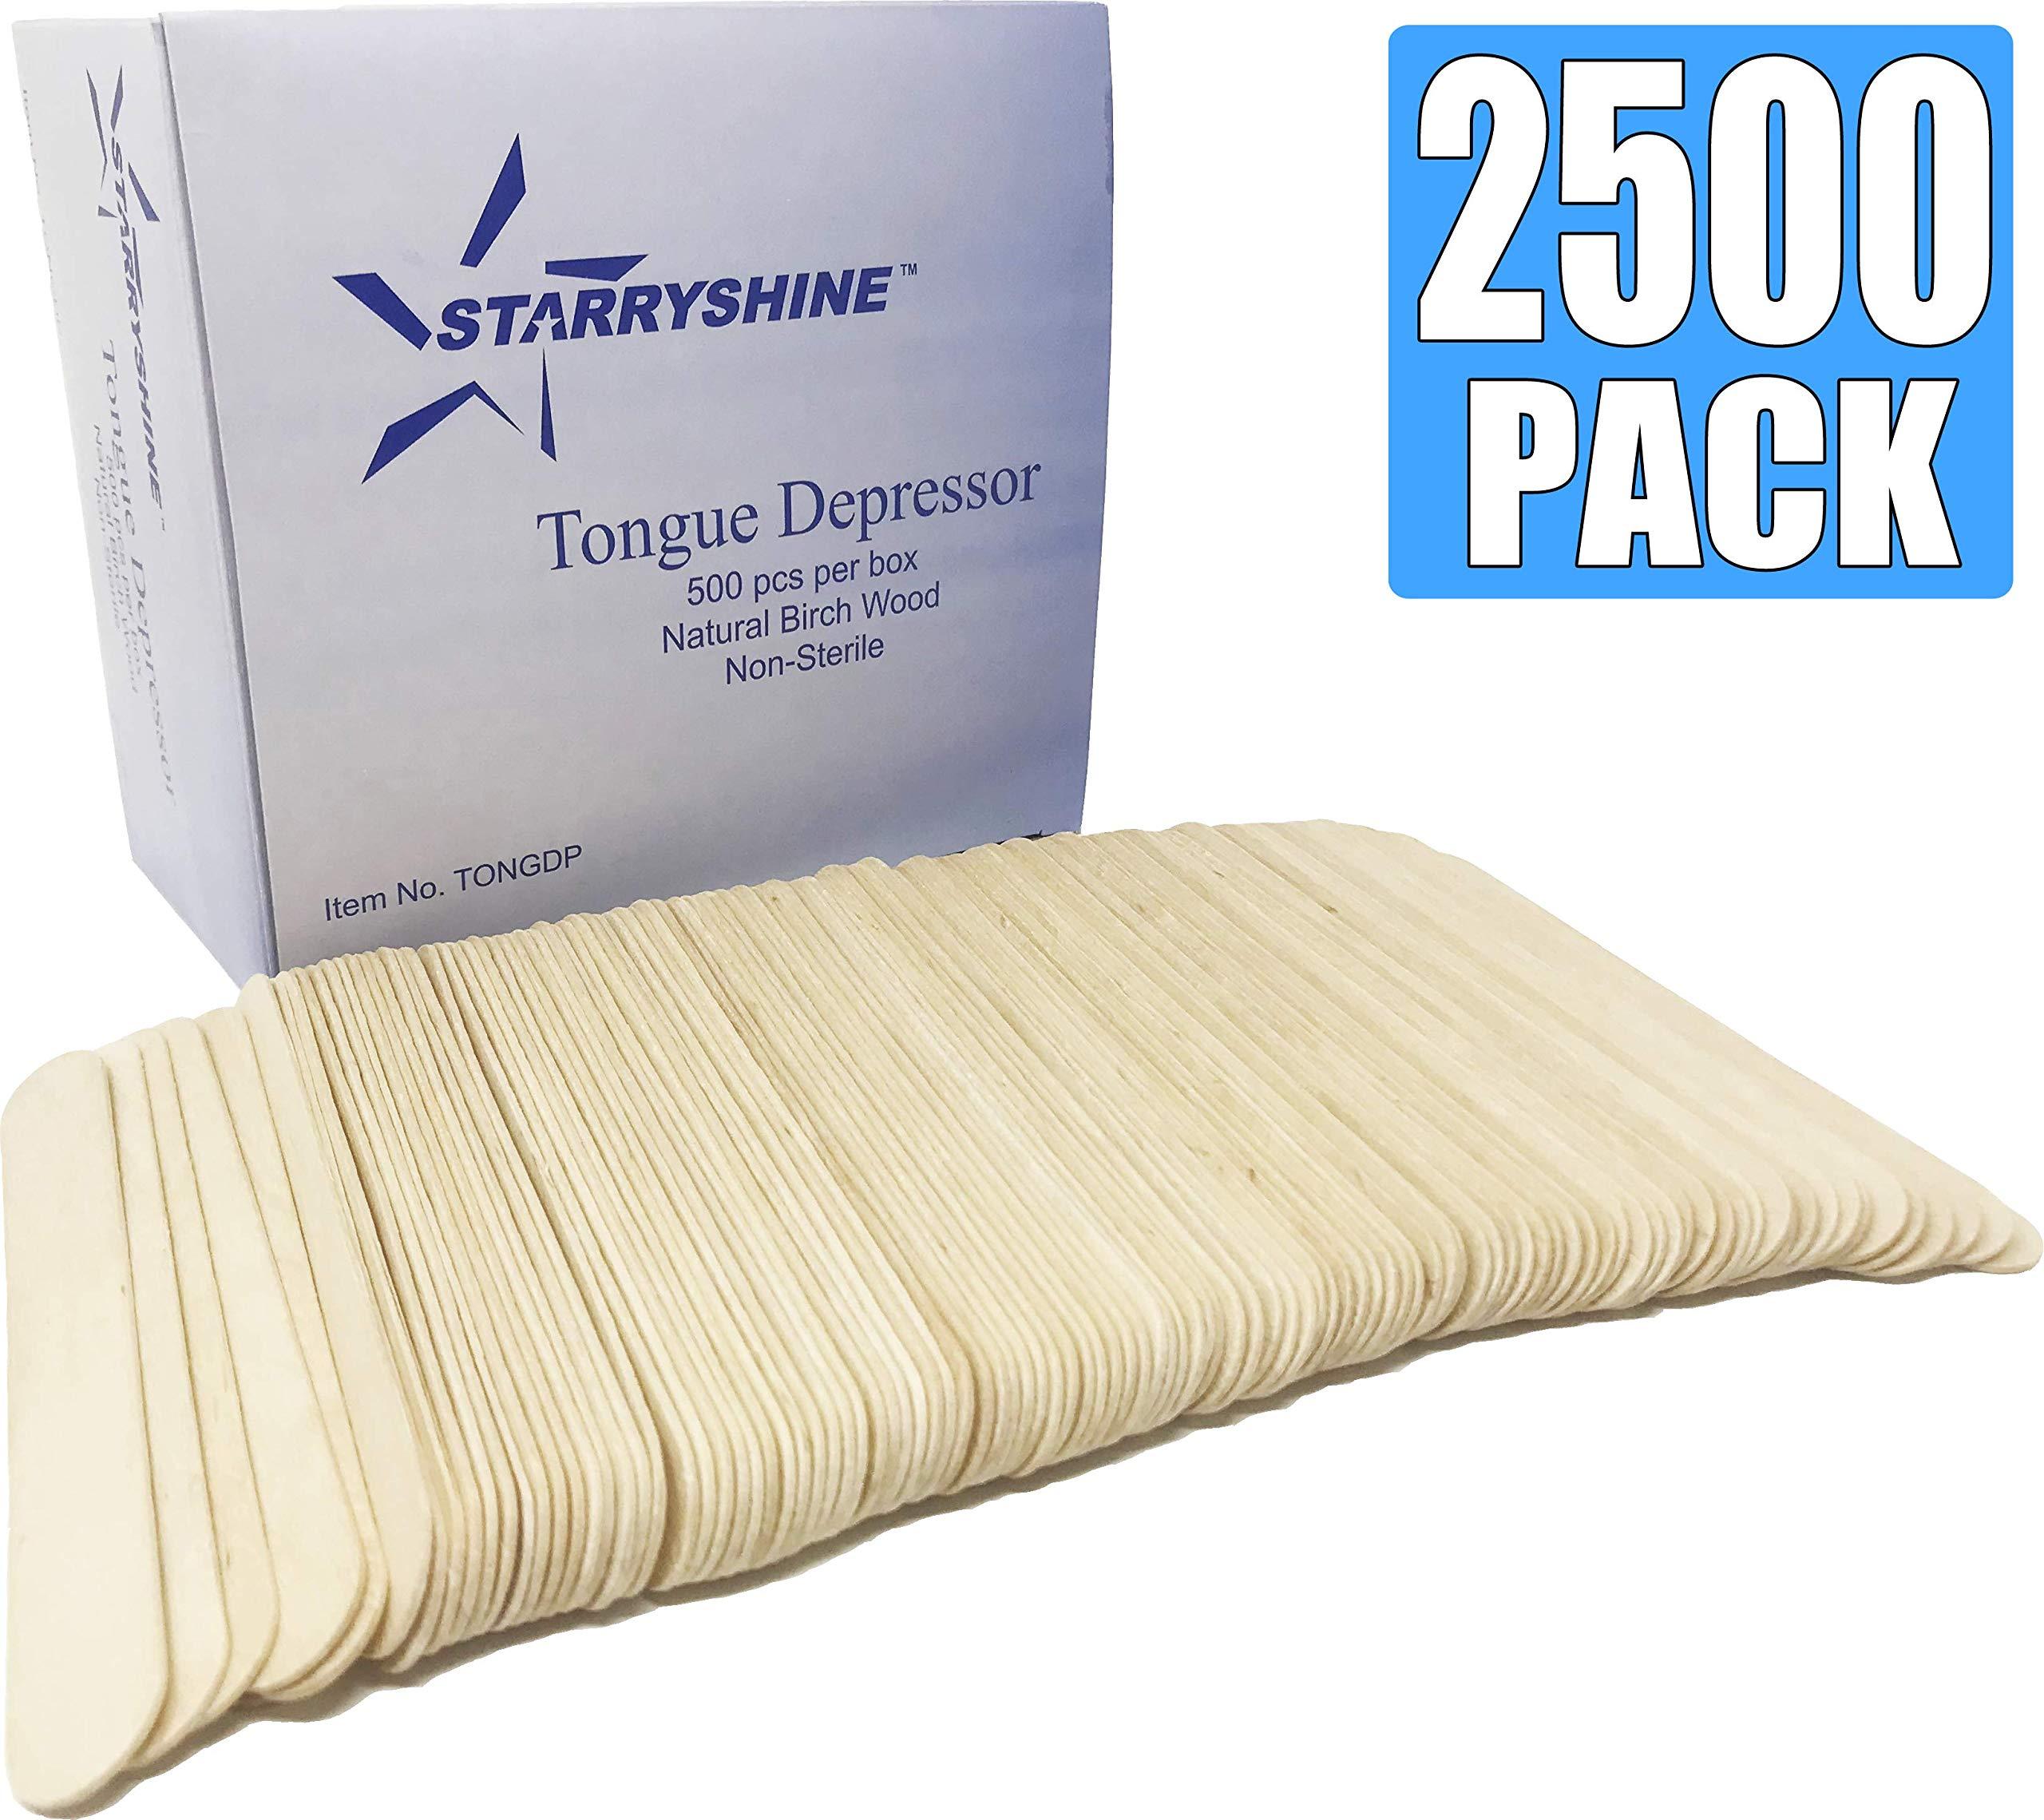 Tongue Depressors Non-STERILE Standard Size 6''x0.75'', Premium Natural Birch Wood Craft Sticks (2500 PCS (5 BX)) by Starryshine (Image #1)